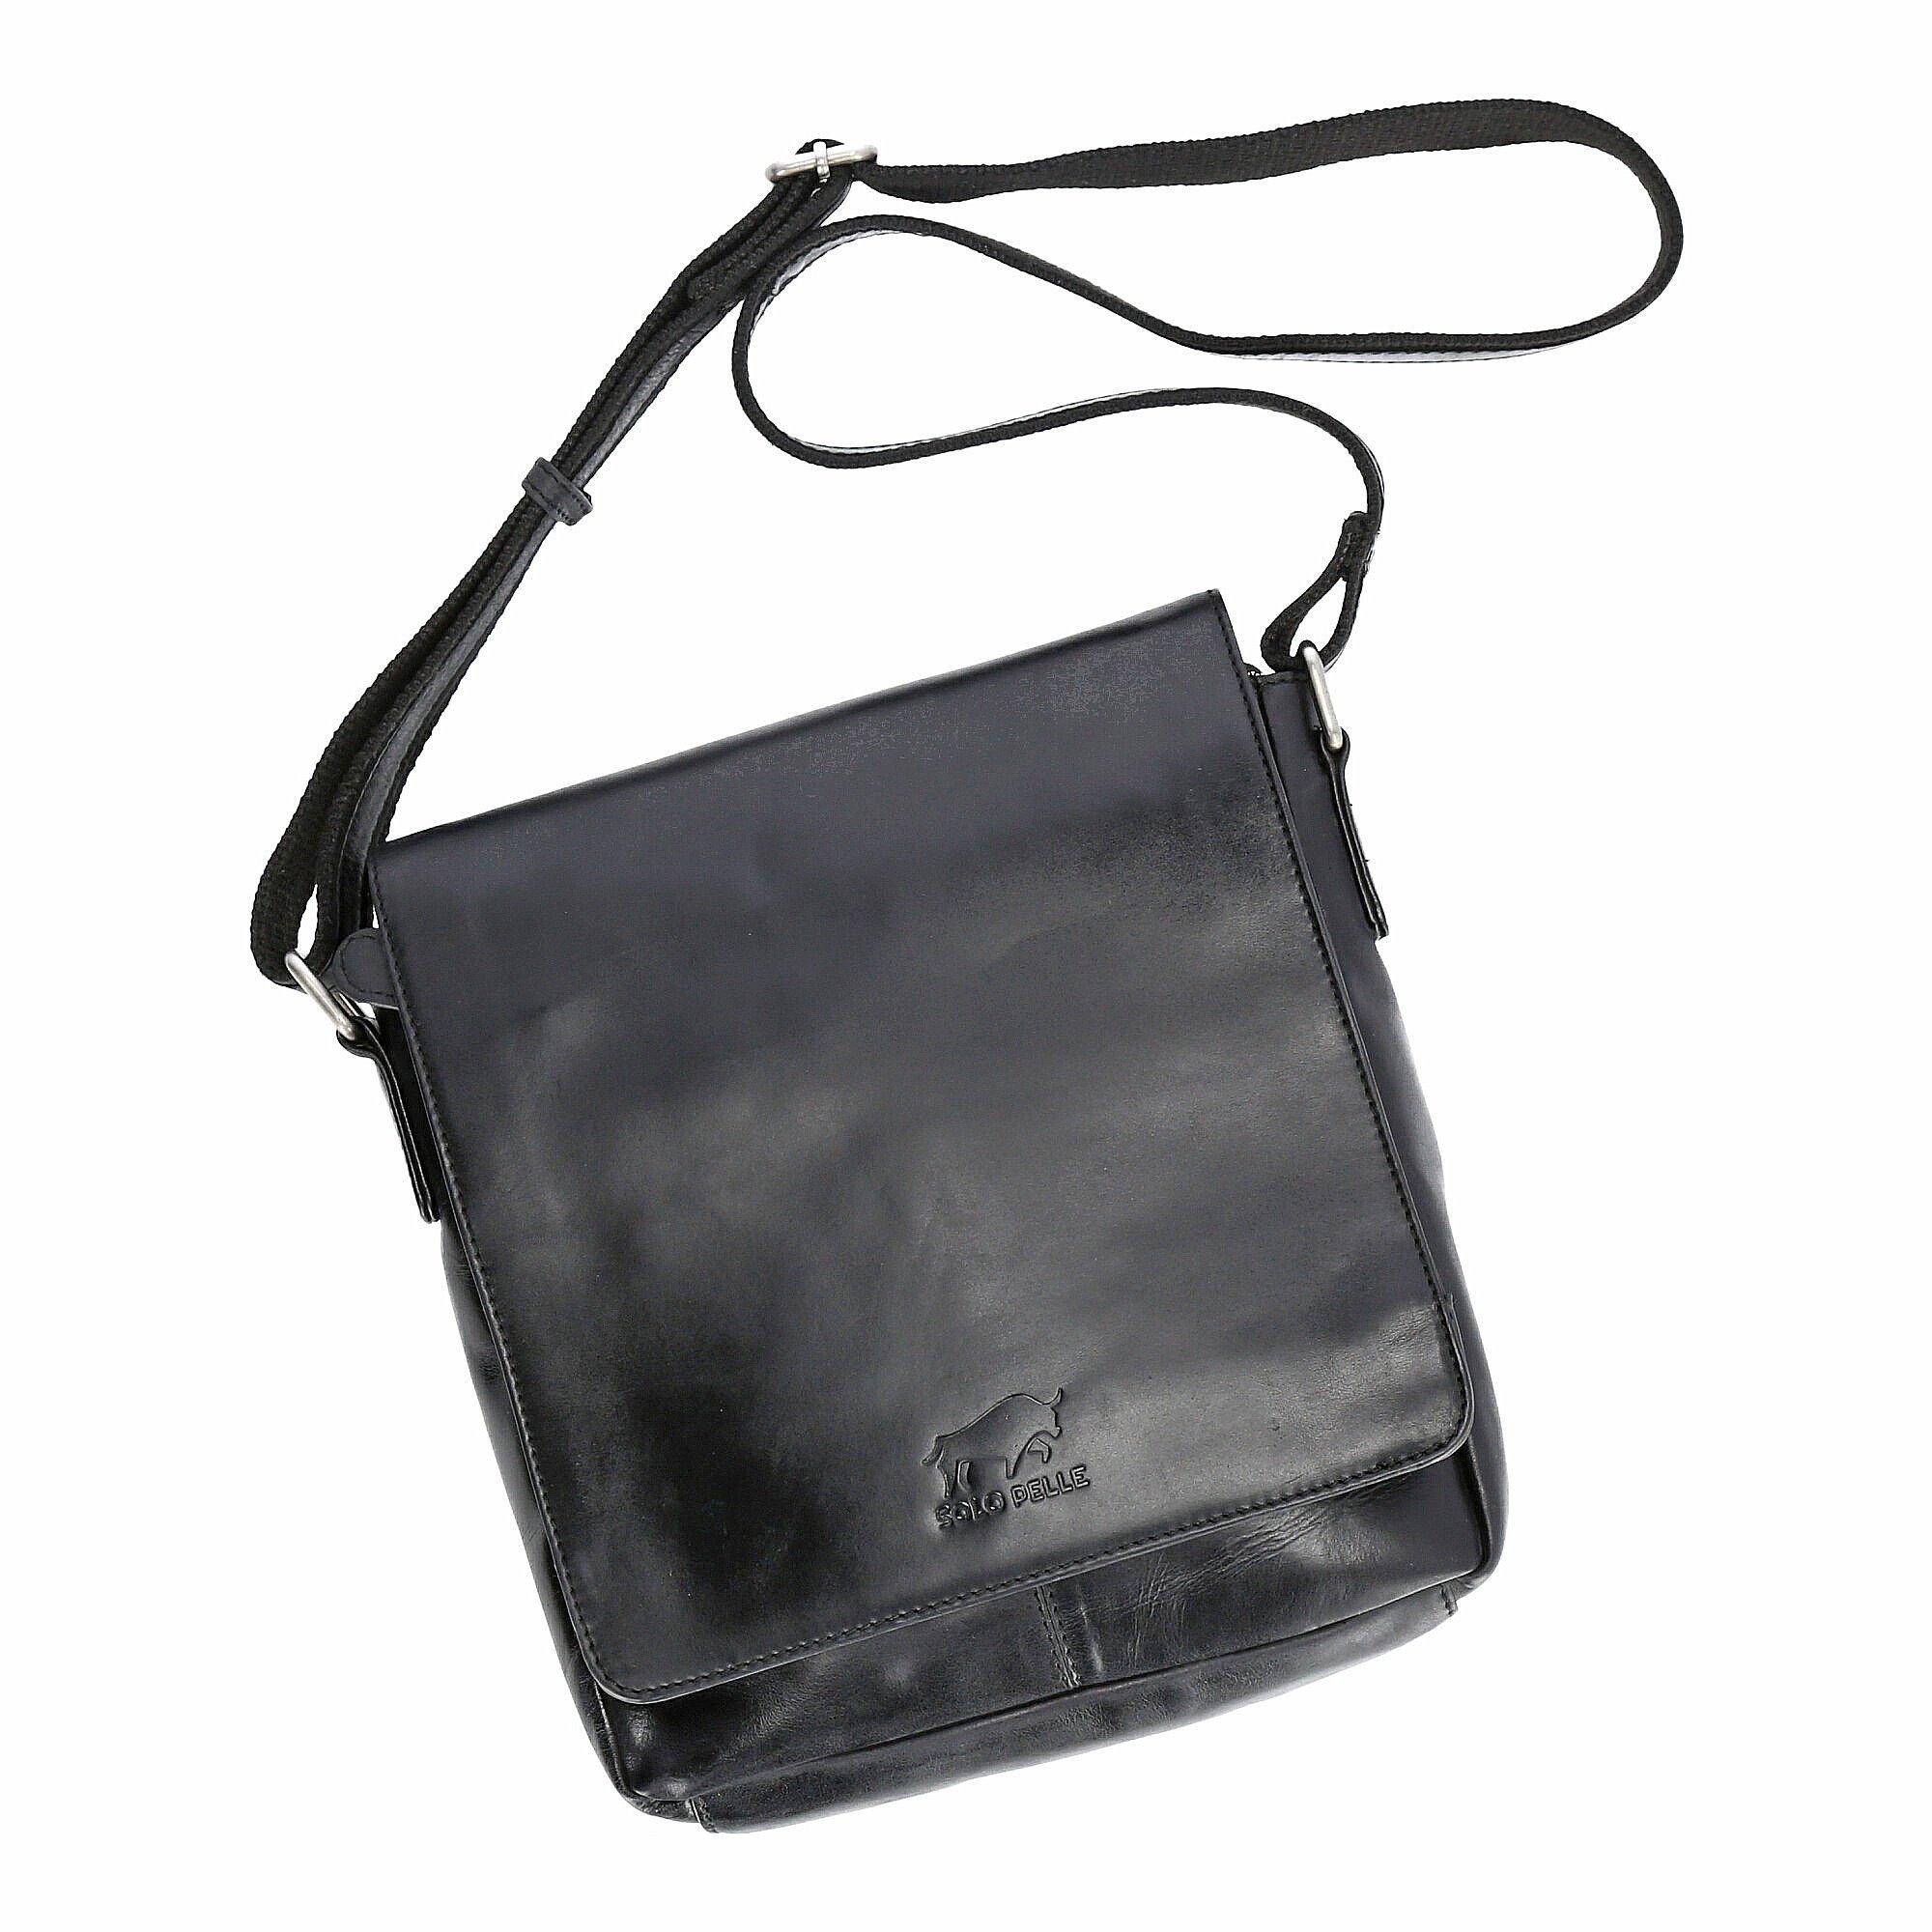 Solo Pelle Messenger Tasche I Schultertasche I Umhängetasche aus echtem Leder Model: Ervin (Vintage Schwarz)